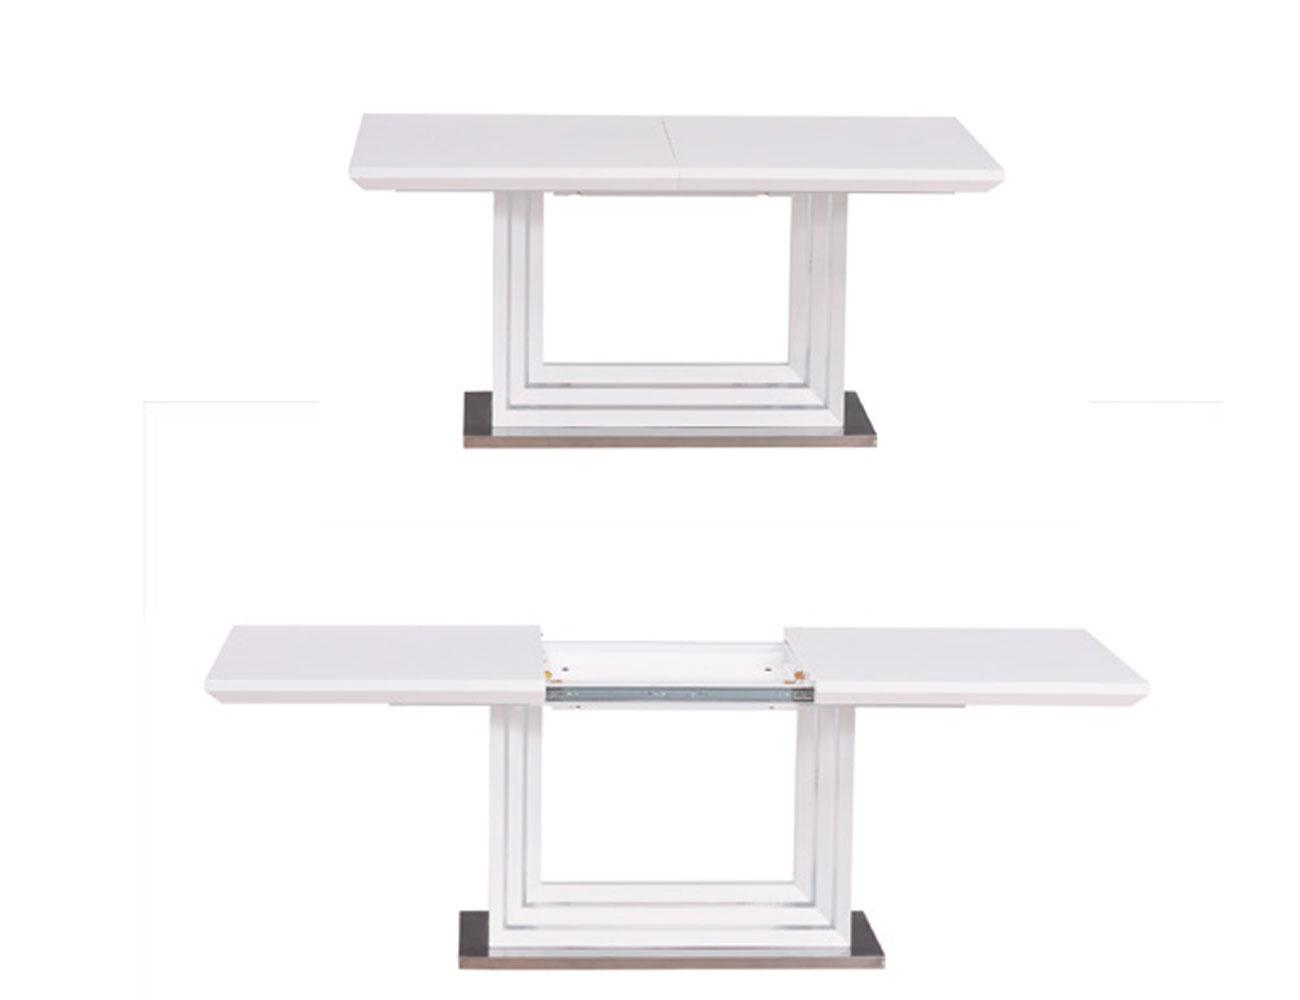 Mesa comedor lacada blanca alto brillo extensible 21